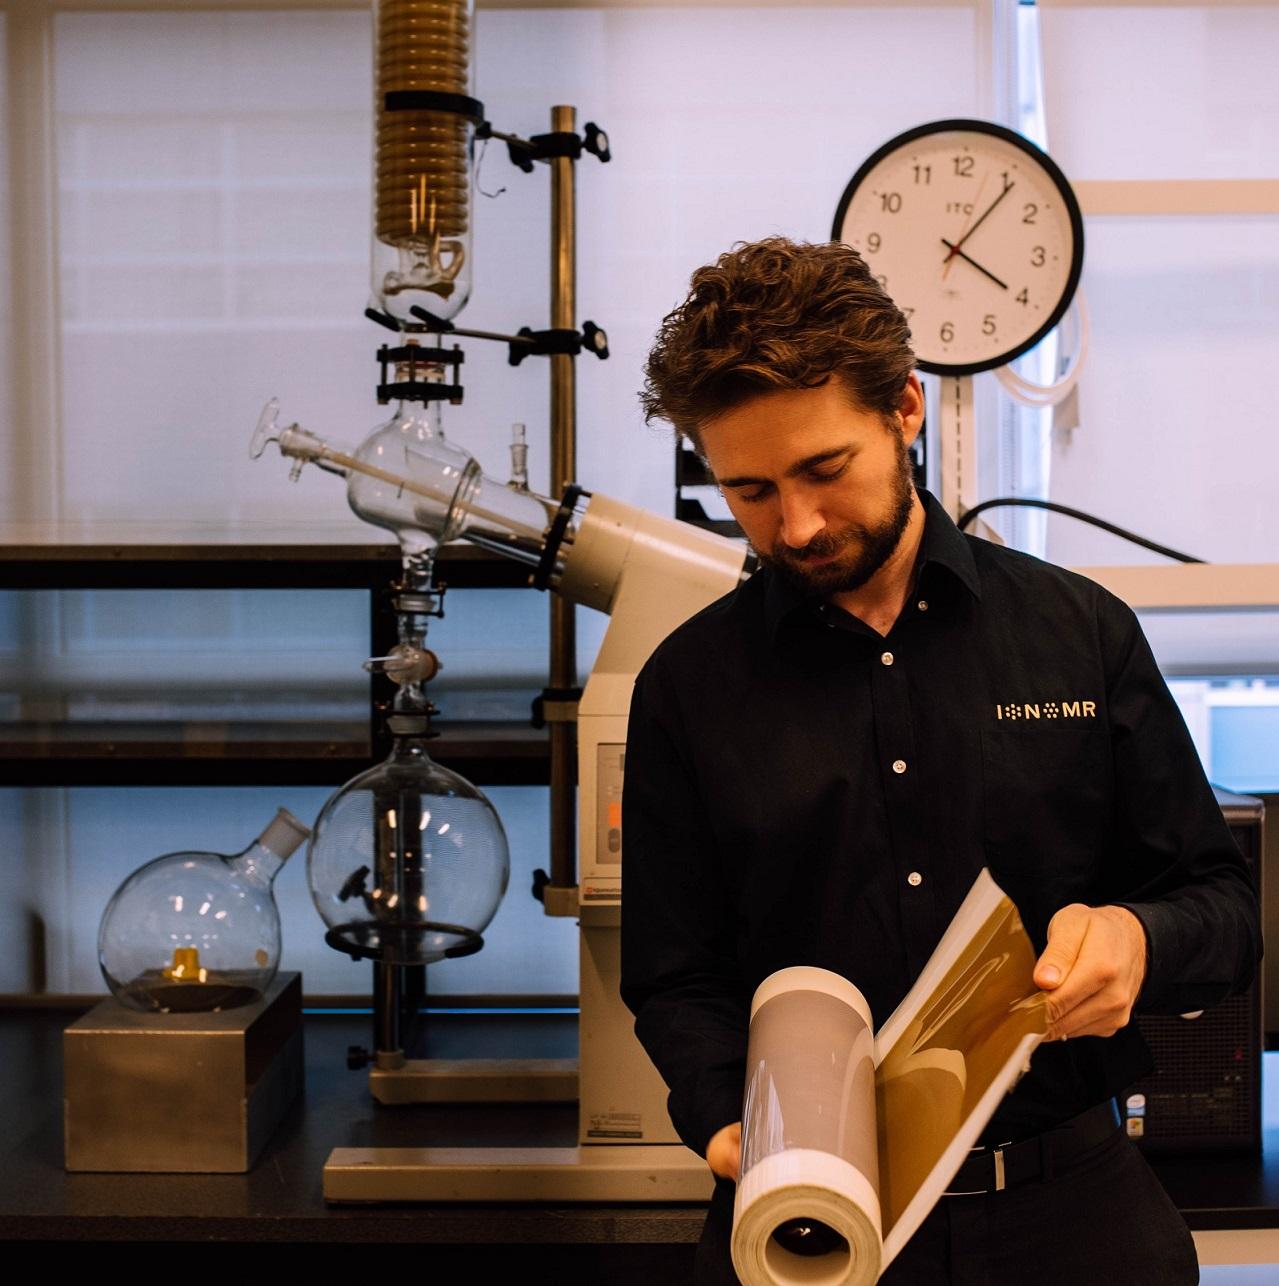 Ionomr Innovations荣获世界经济论坛表彰为技术先锋